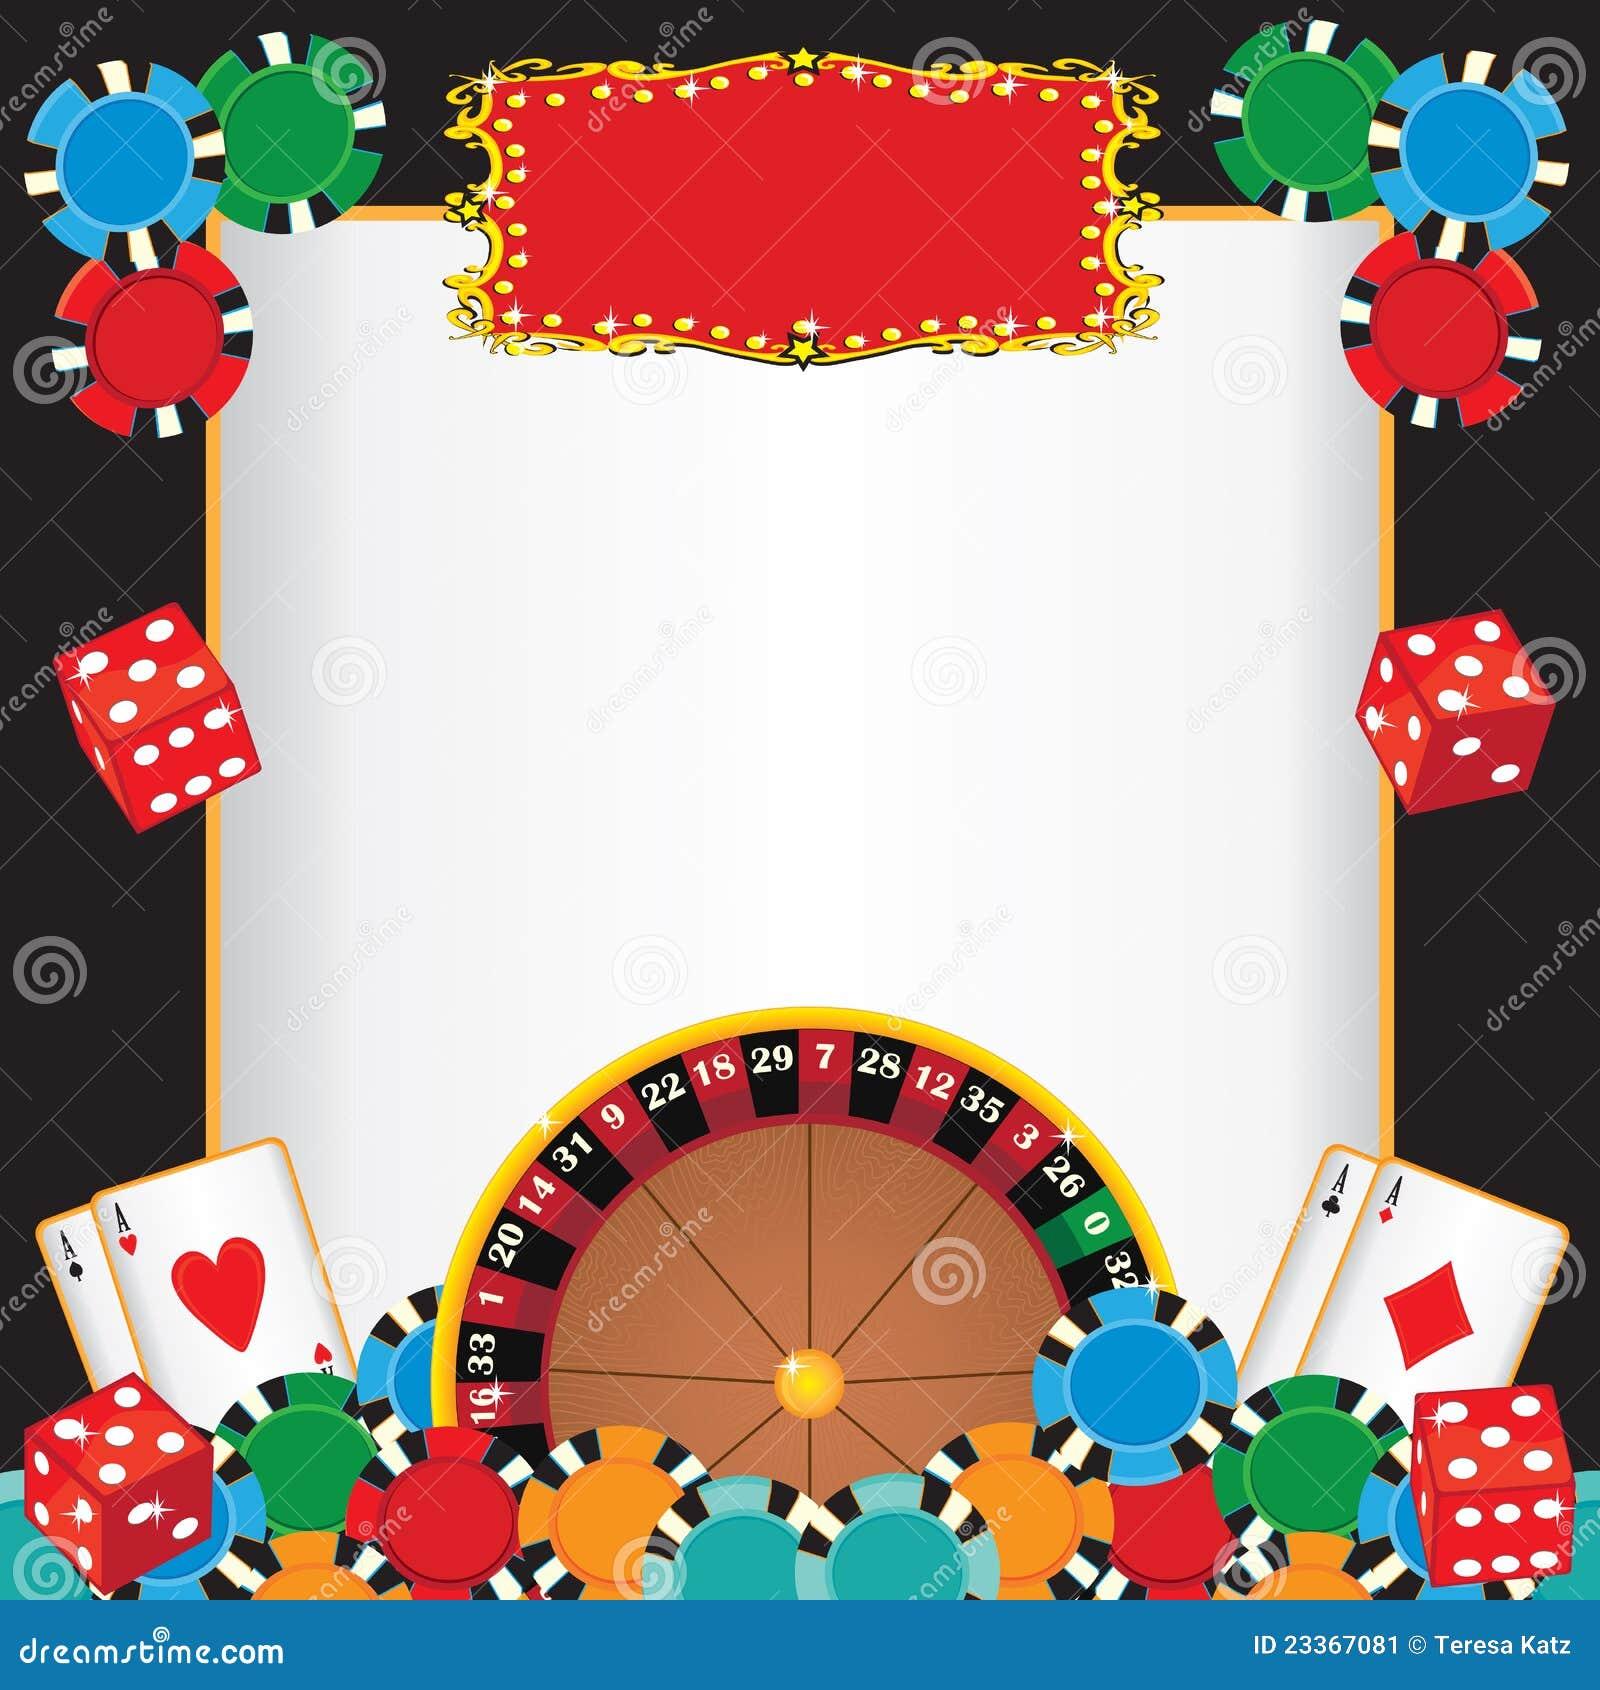 gratis casino roulette hvordan man vinder på kasinoet